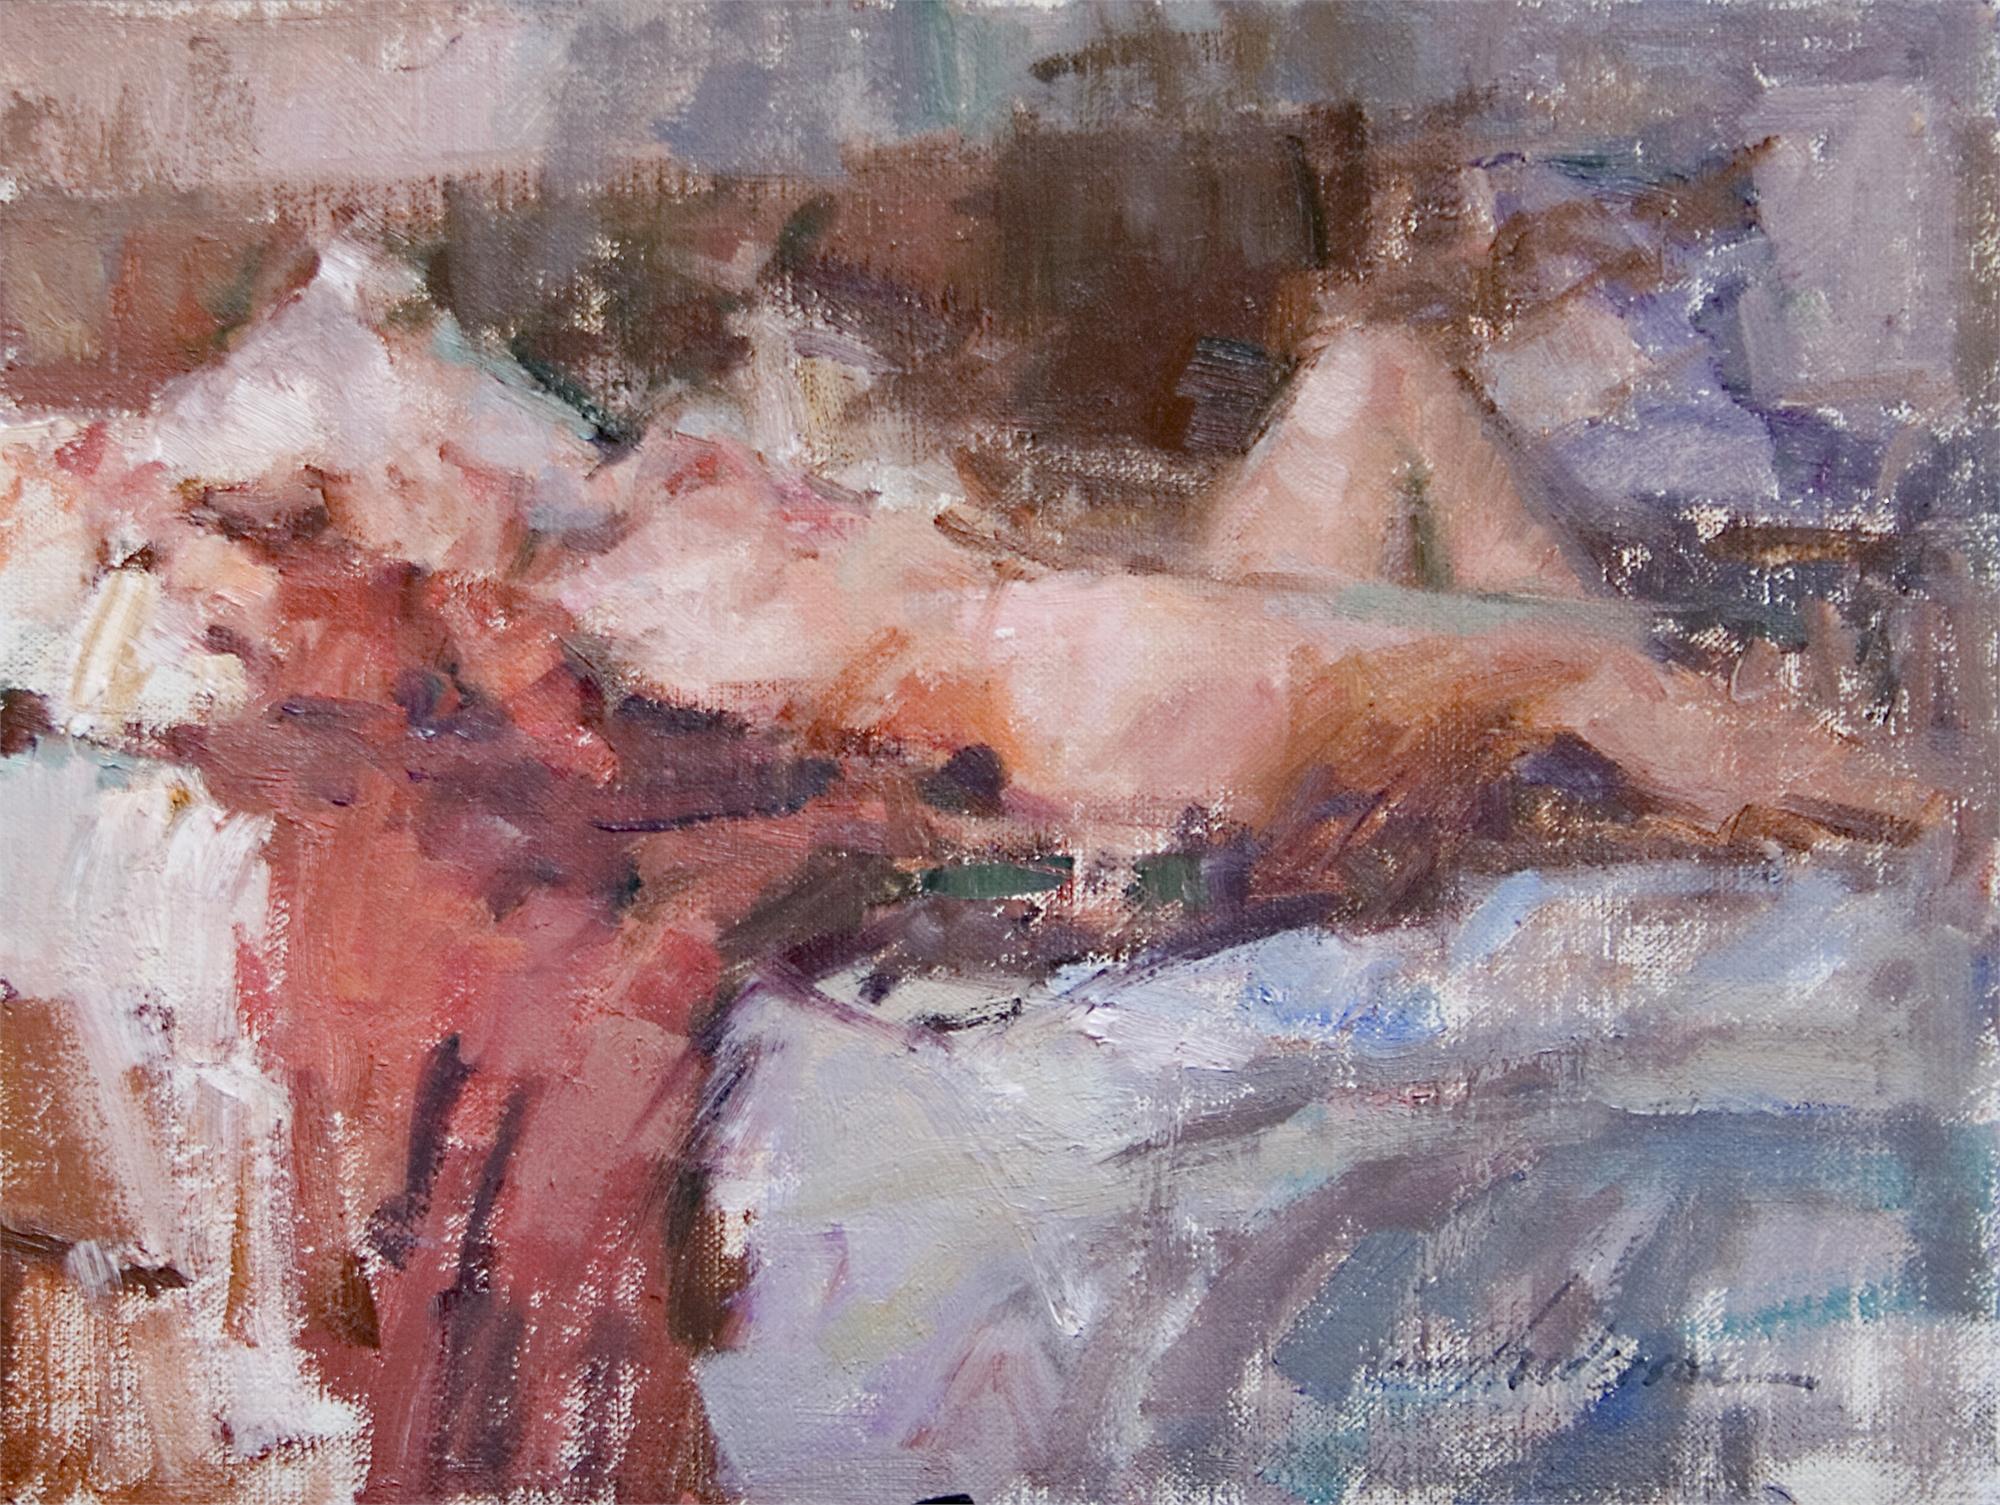 Reclining Nude by Carolyn Anderson